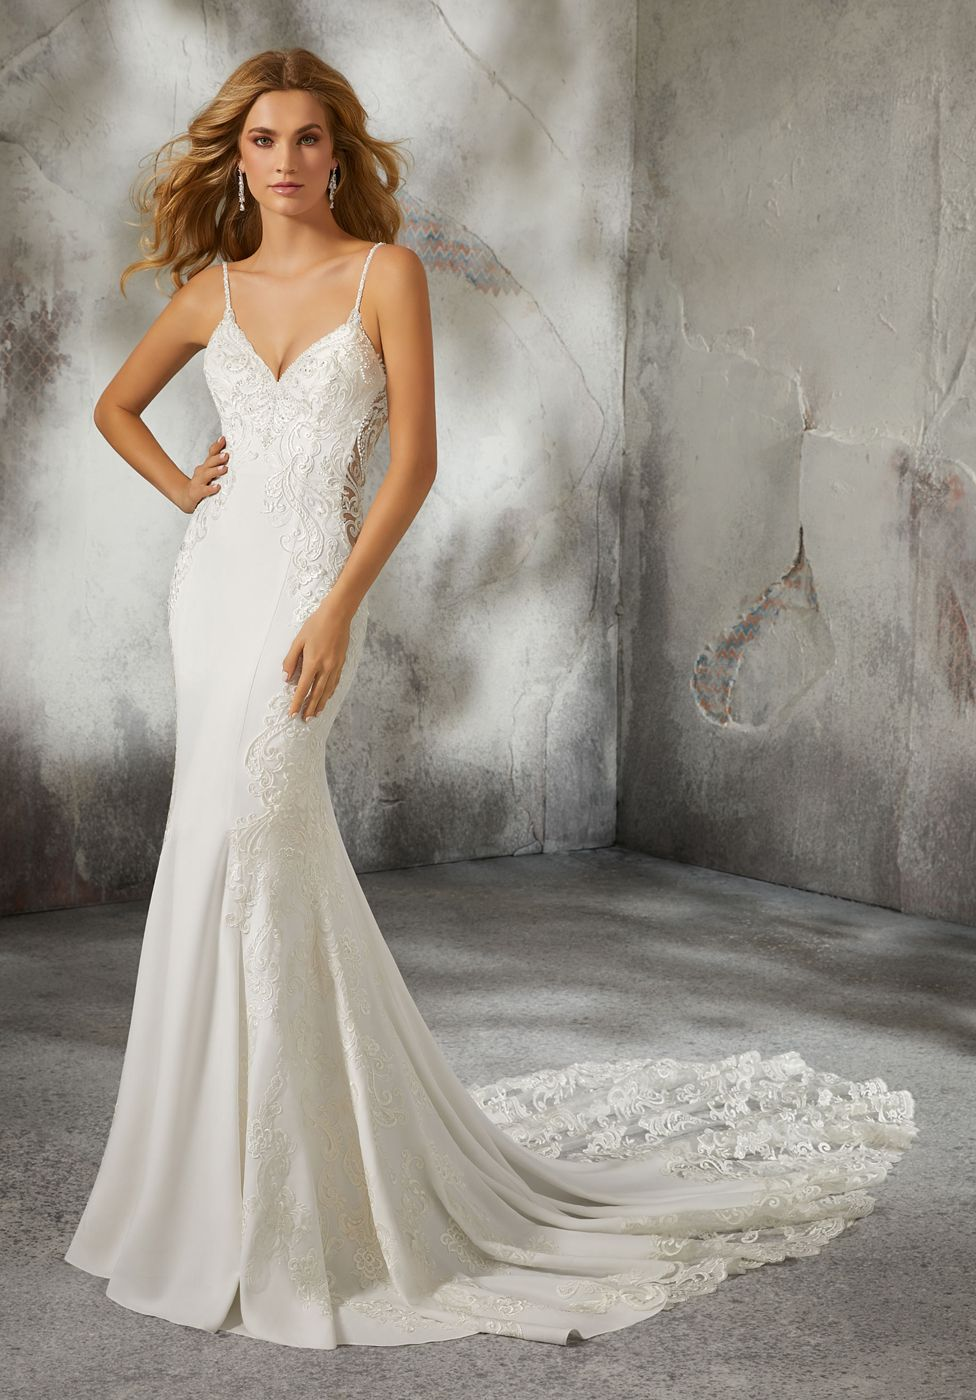 Mori Lee 8283 Lizzie Sheer Sides Wedding Dress Fitted Wedding Dress Mori Lee Wedding Dress Chic Bridal Gown